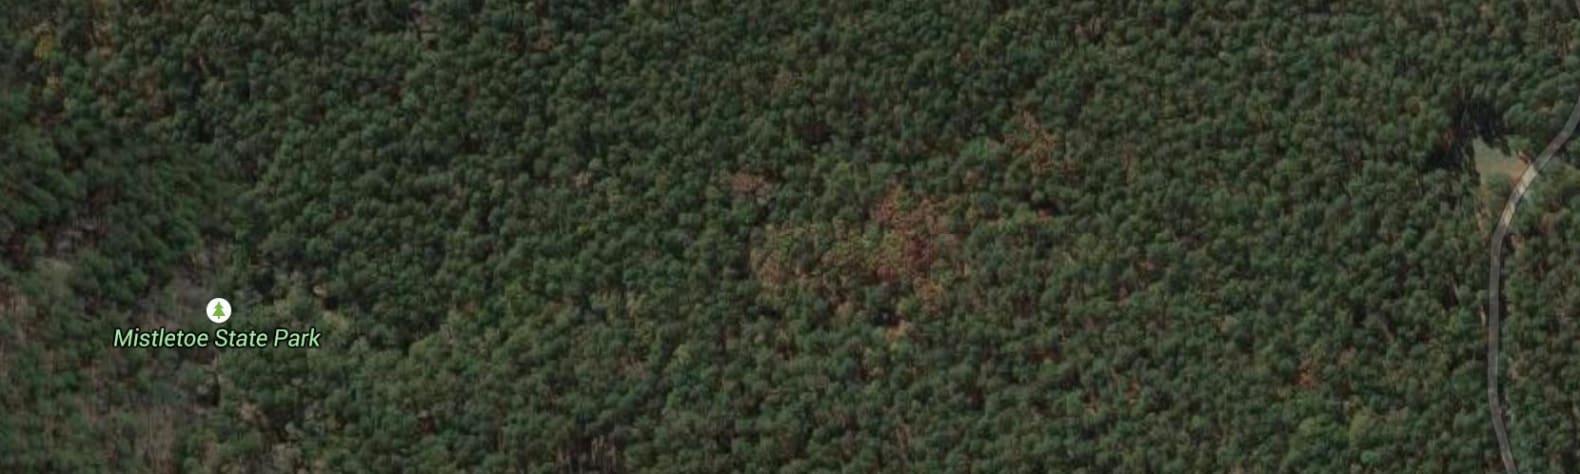 Mistletoe State Park